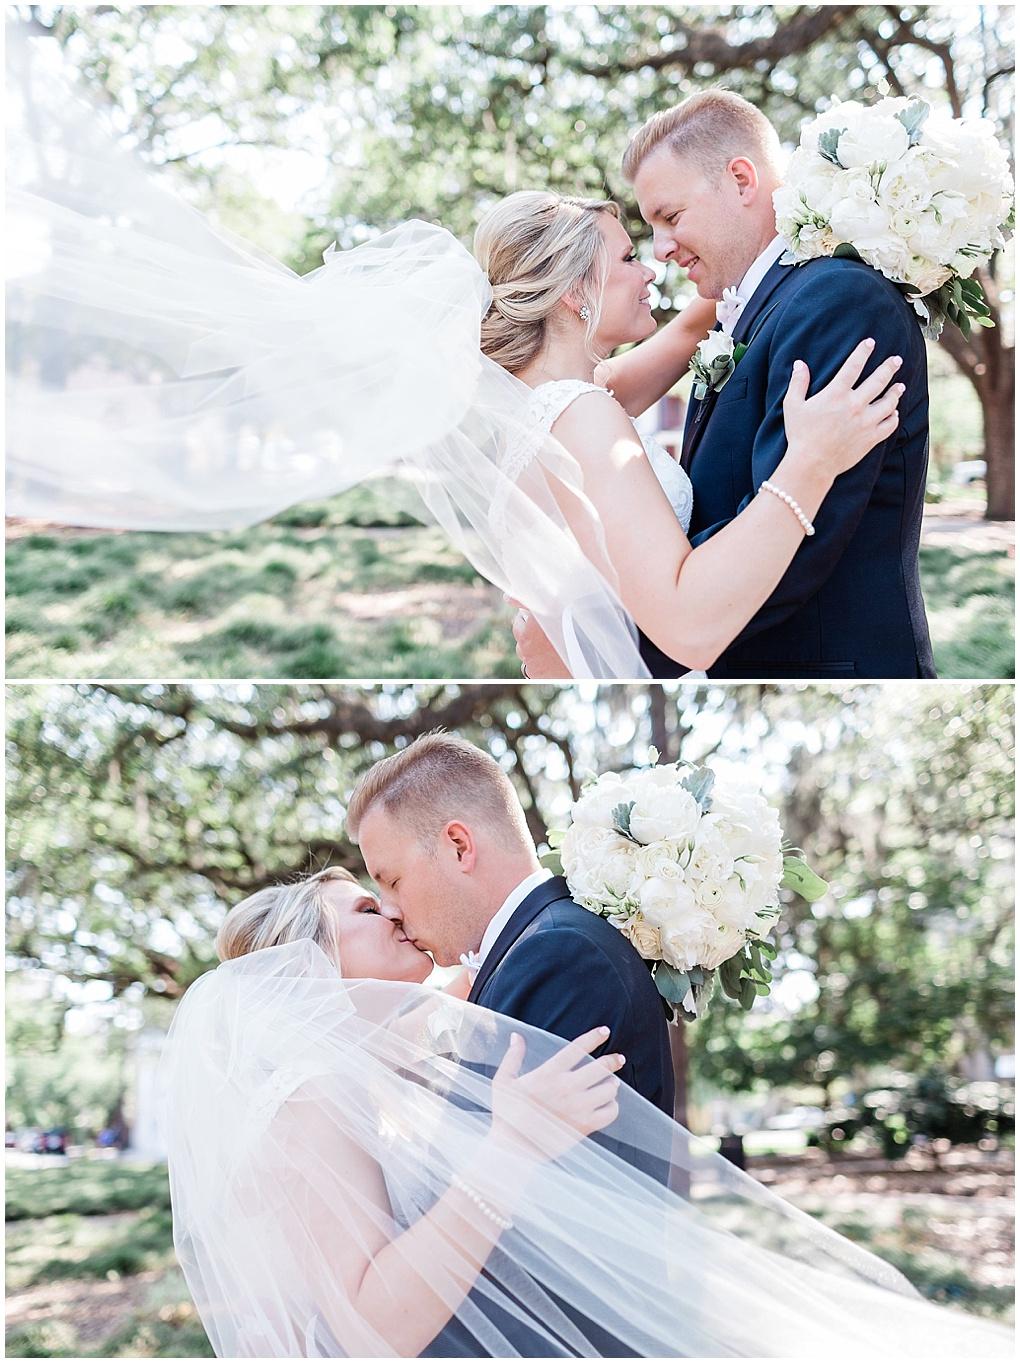 Meghan + Evan's Savannah Wedding | Savannah Wedding Photographer | Apt. B Photography